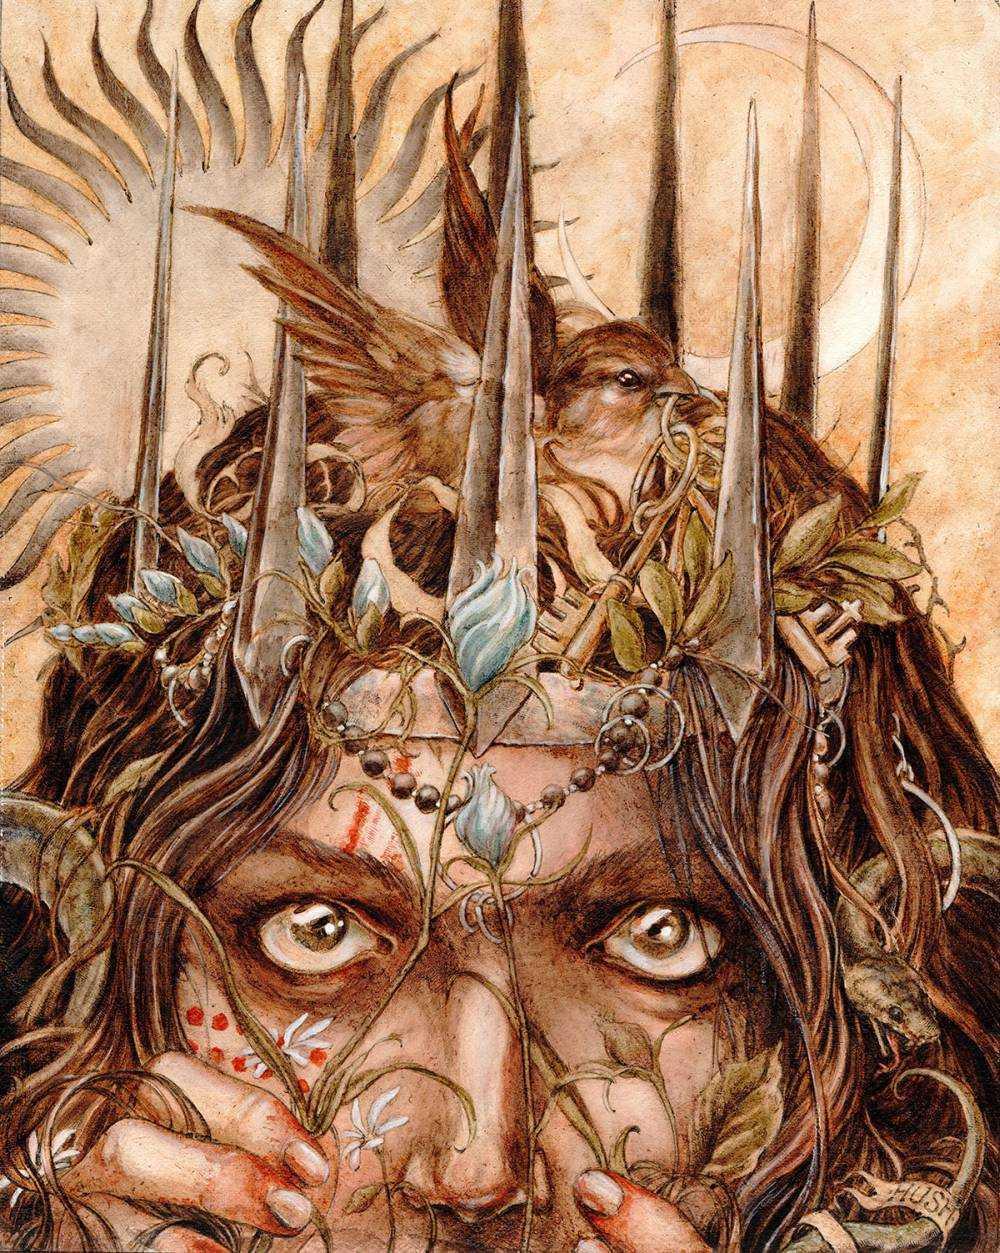 Jeremy hush - Illustrations 458lpo